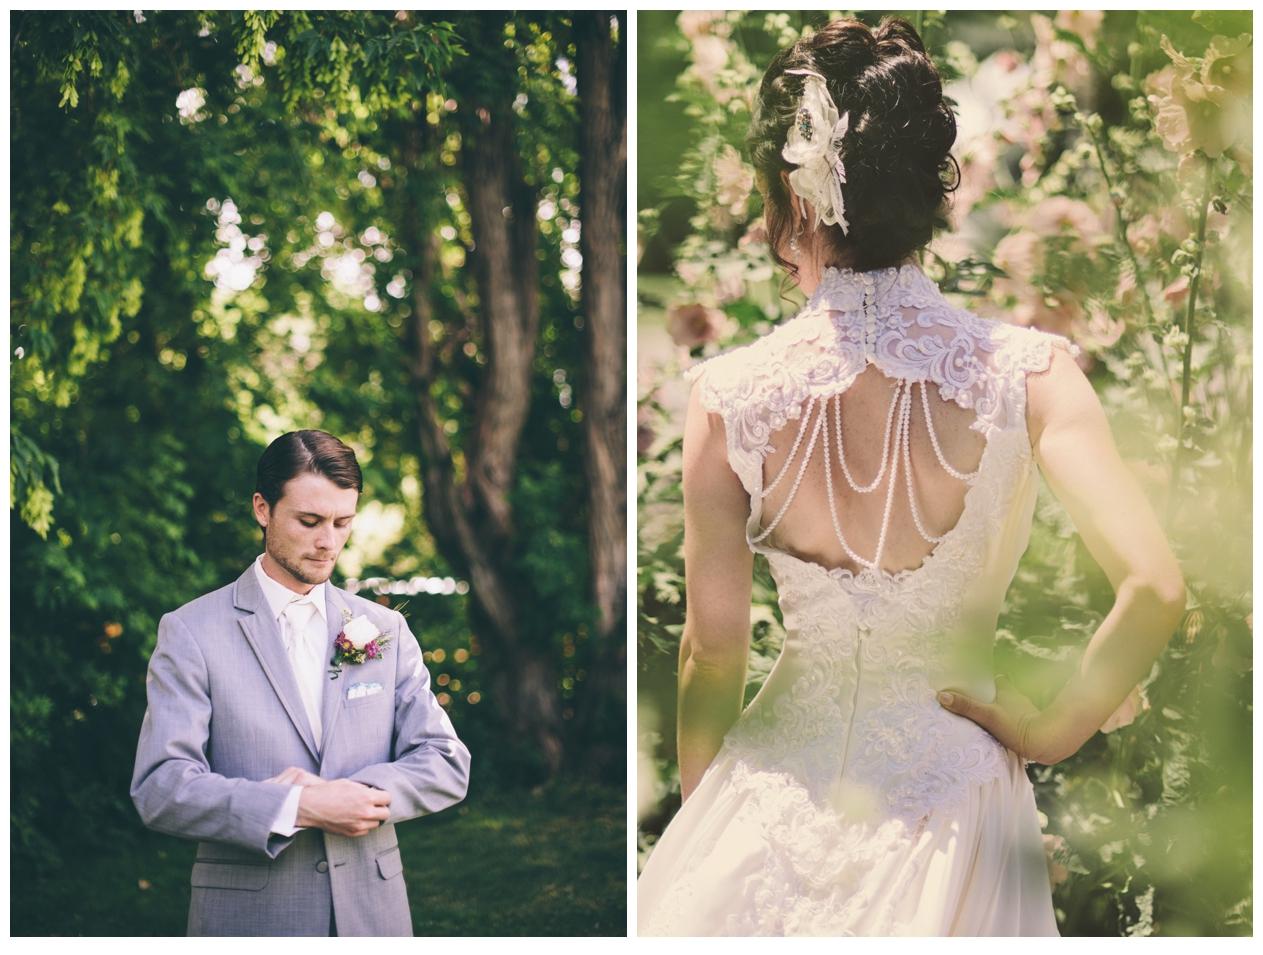 018-AmandaKoppImages-Colorado-Farm-Wedding-Photo.jpg